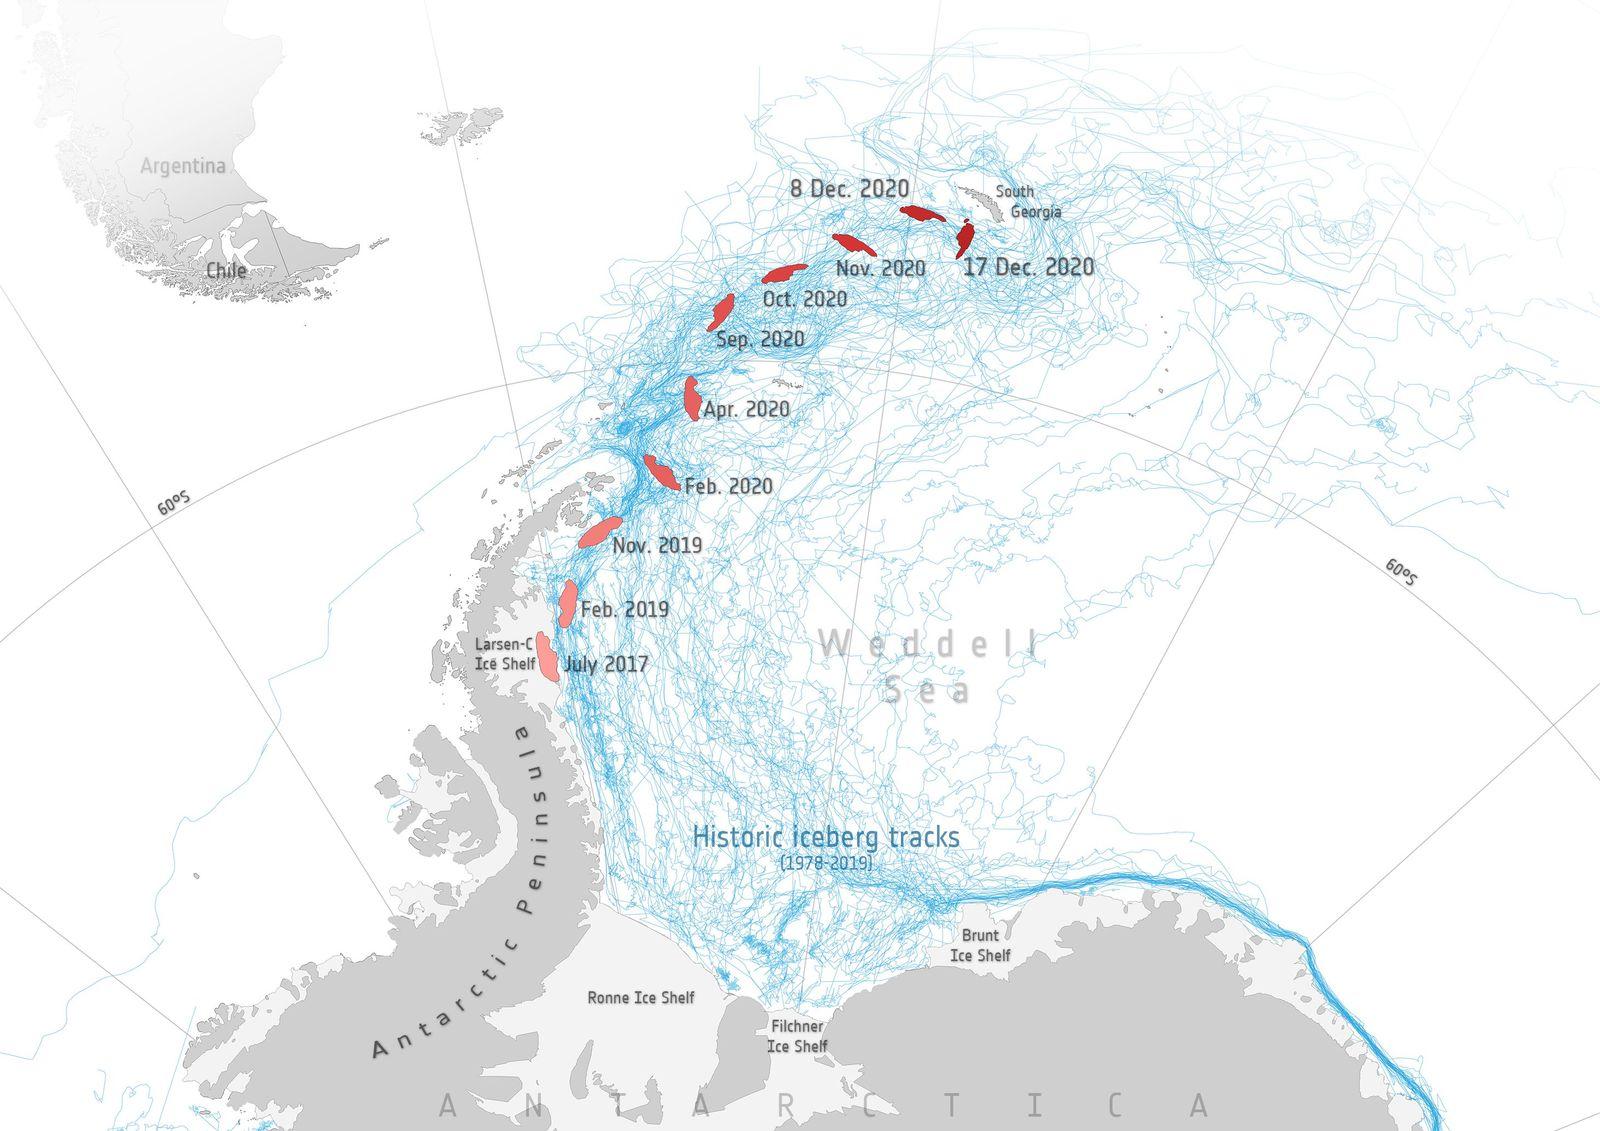 A-68A iceberg loses chunk of ice, Antarctica - 19 Dec 2020